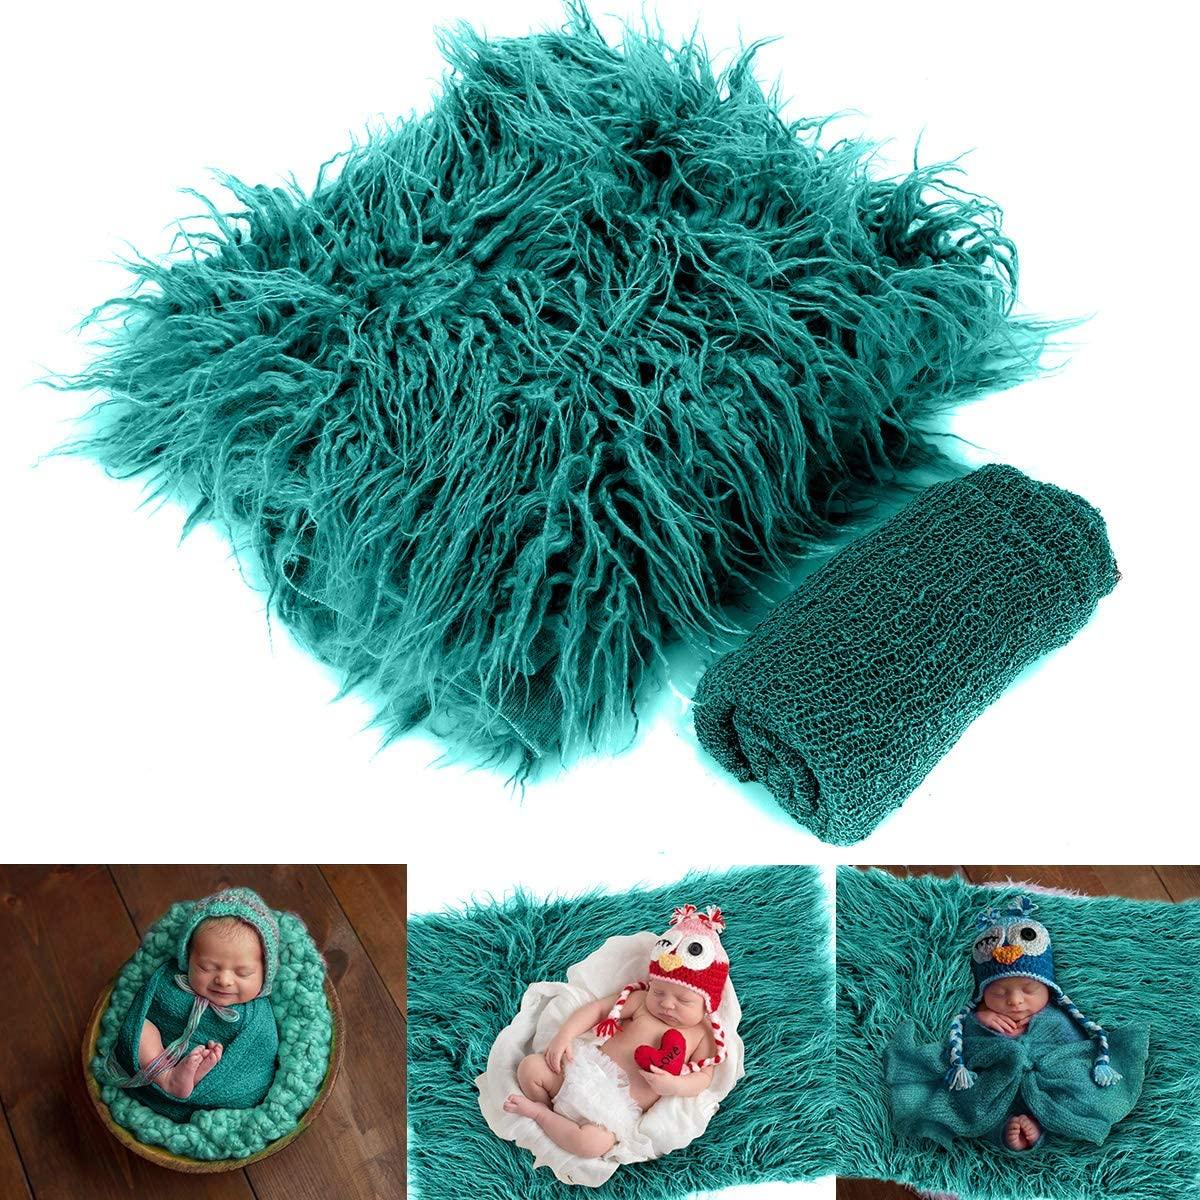 Wallfire 2pcs/Set Baby Photo Props Fluffy Blanket + Ripple Wrap Set Newborn Photography Wrap Mat for Baby Outfits Costume Set - Dark Green